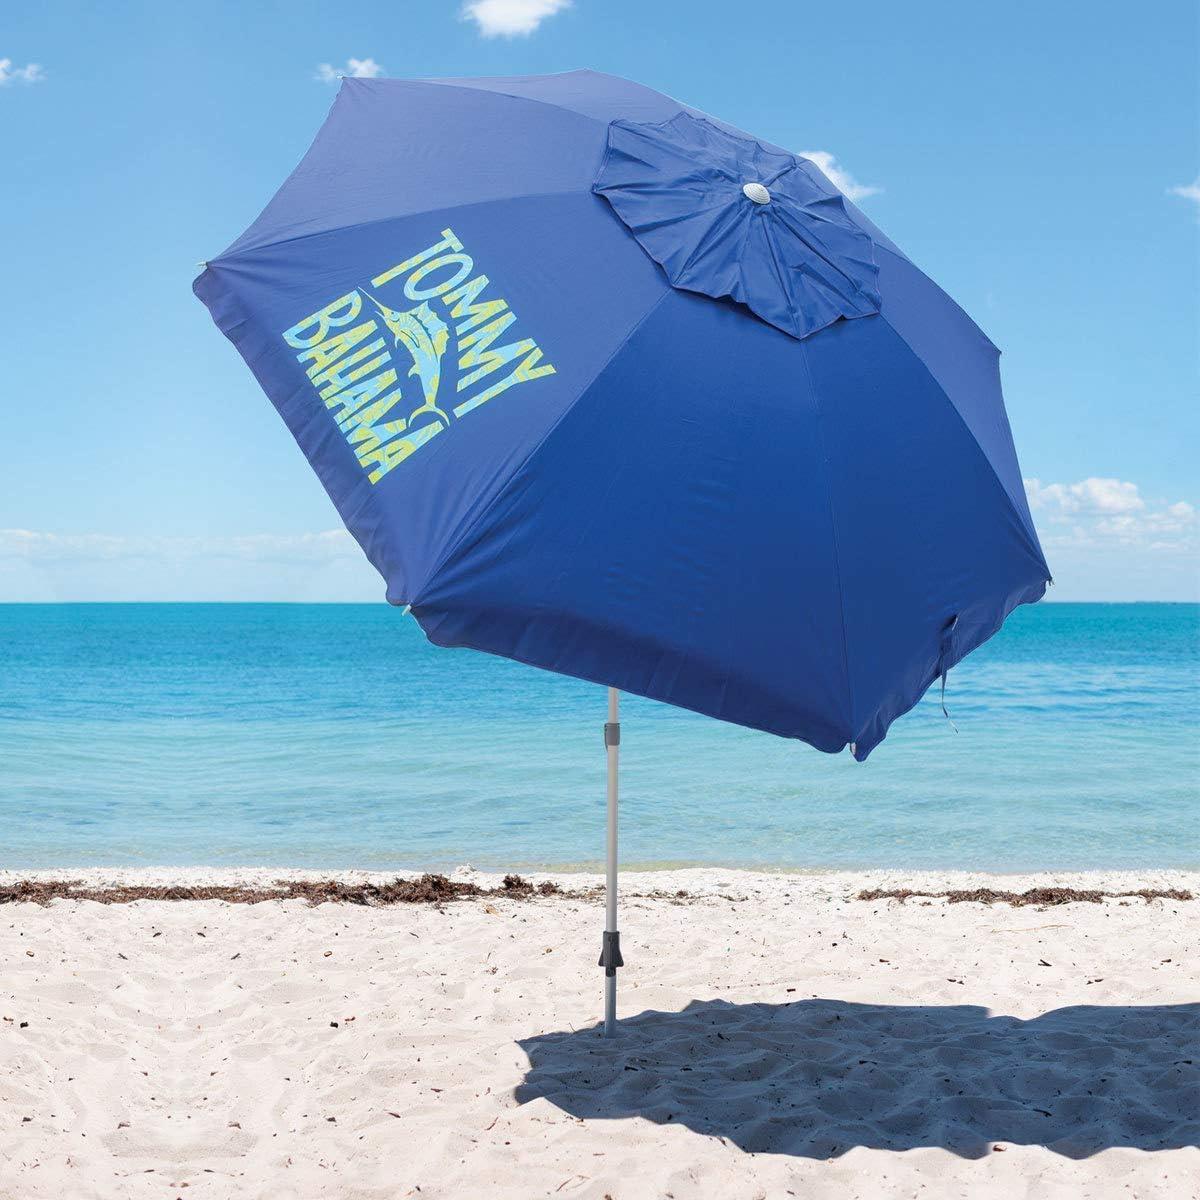 Best Beach Umbrella Australia - Tommy Bahama